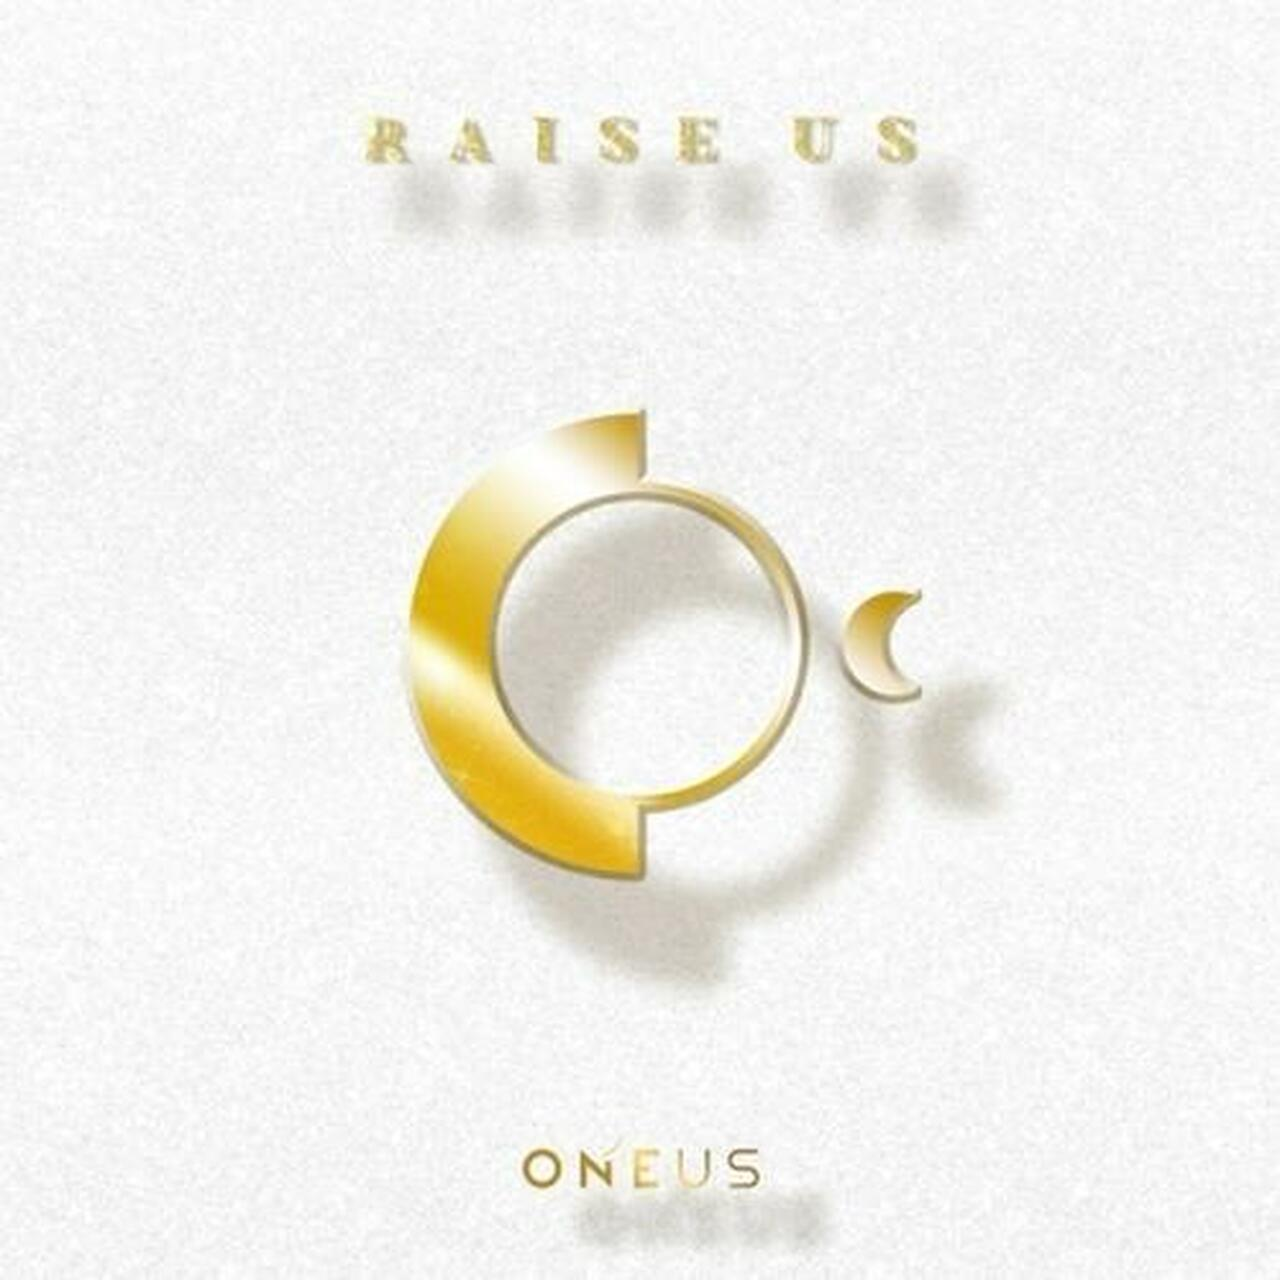 ONEUS - 2nd Mini [RAISE US] (Twilight Ver.)